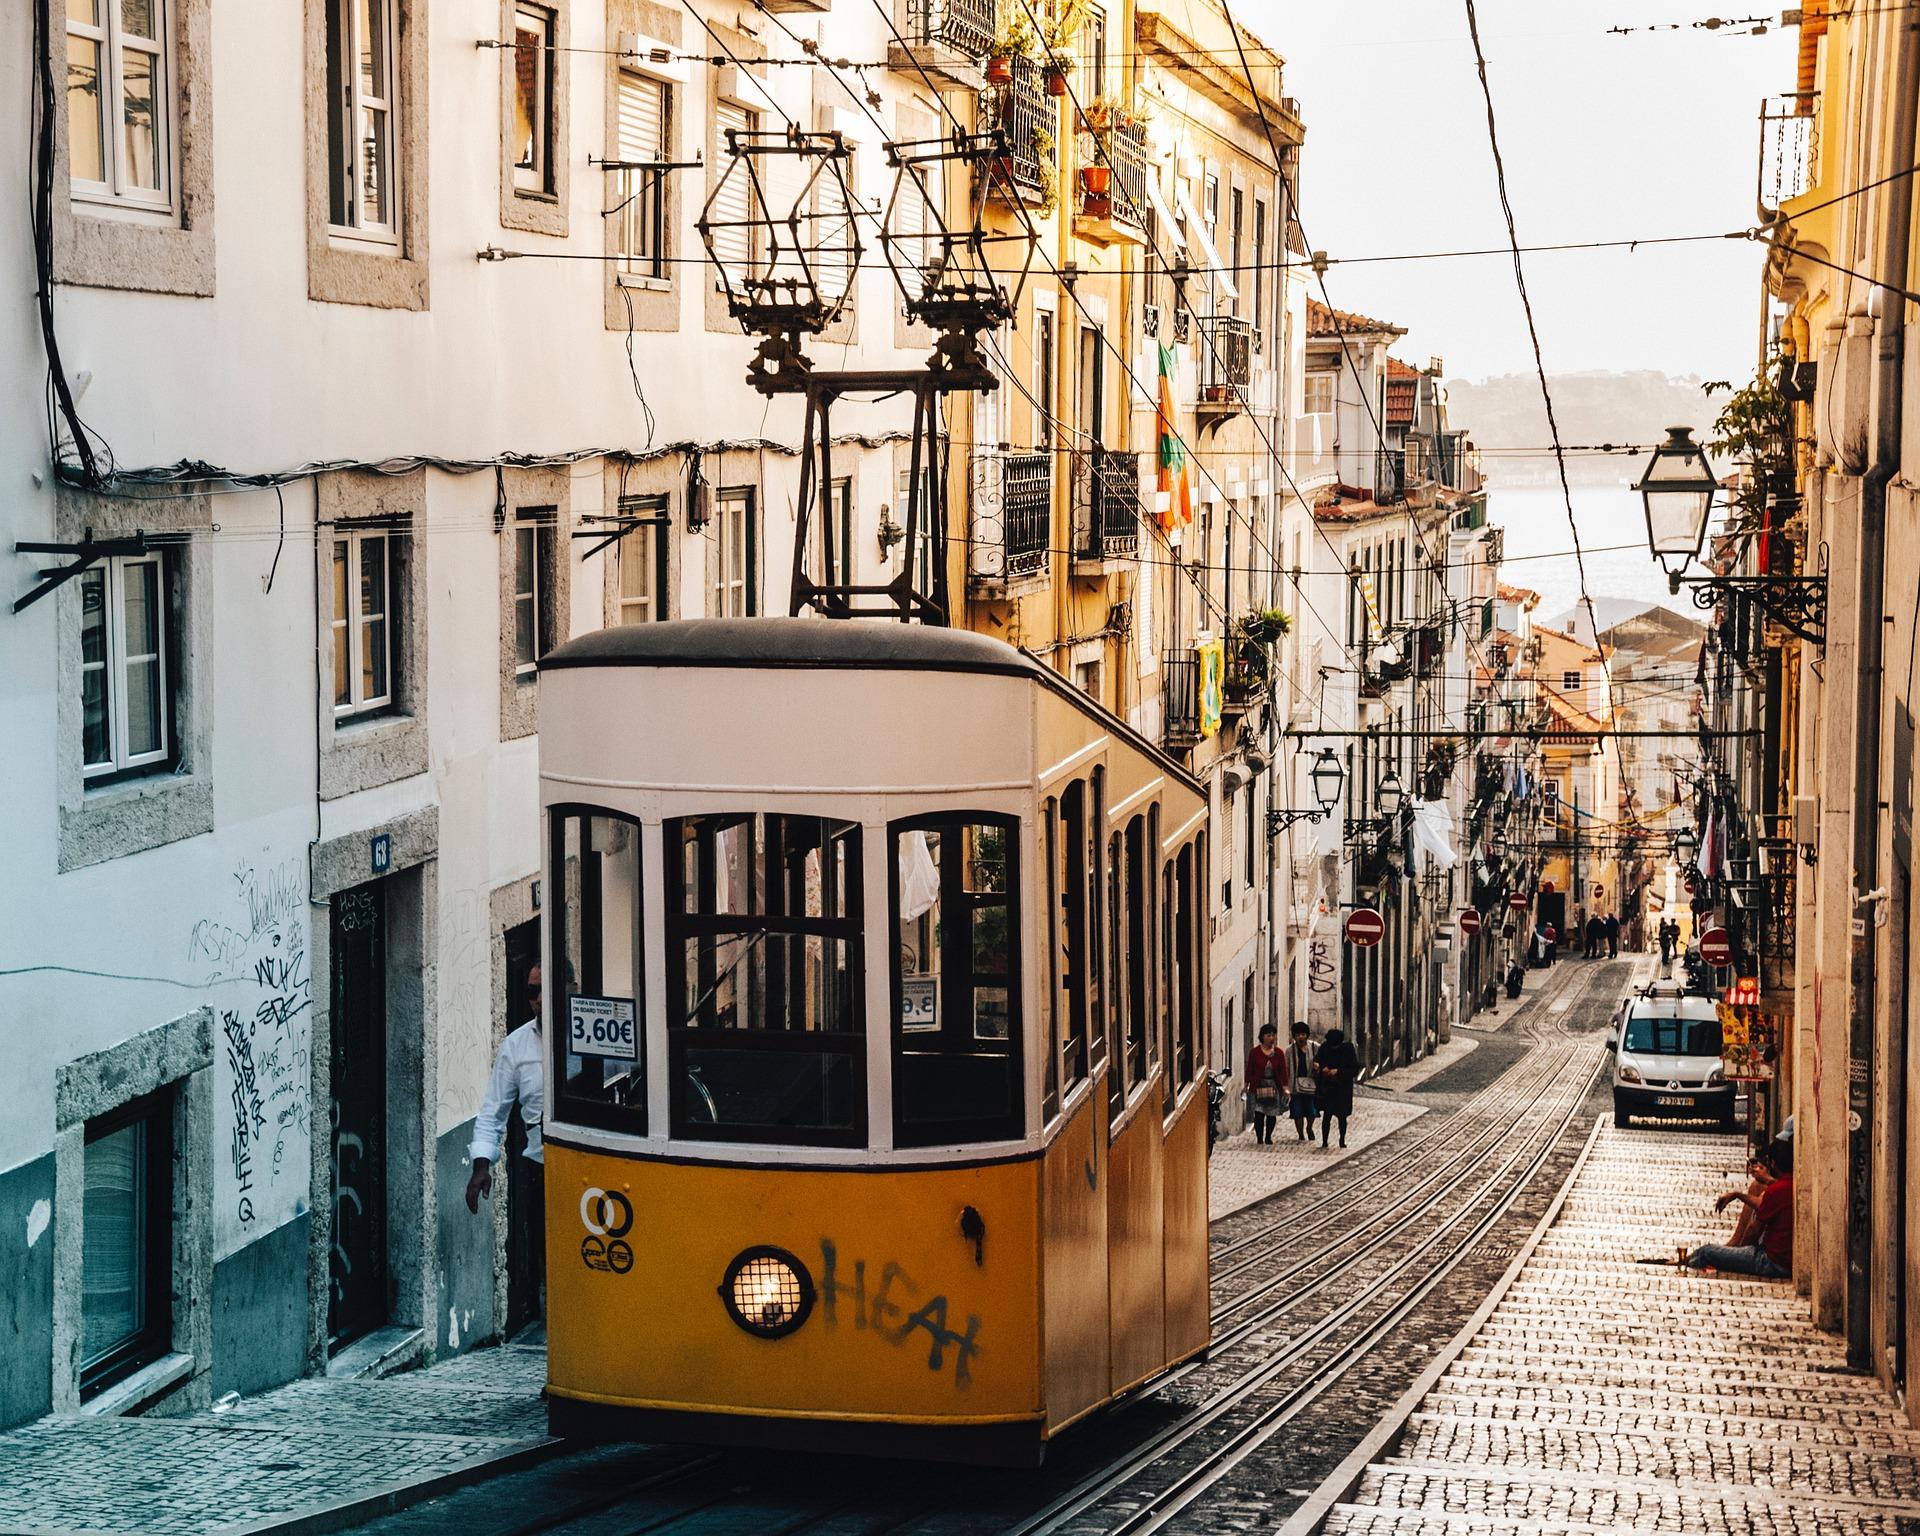 Trolley, Lisbon, Tram